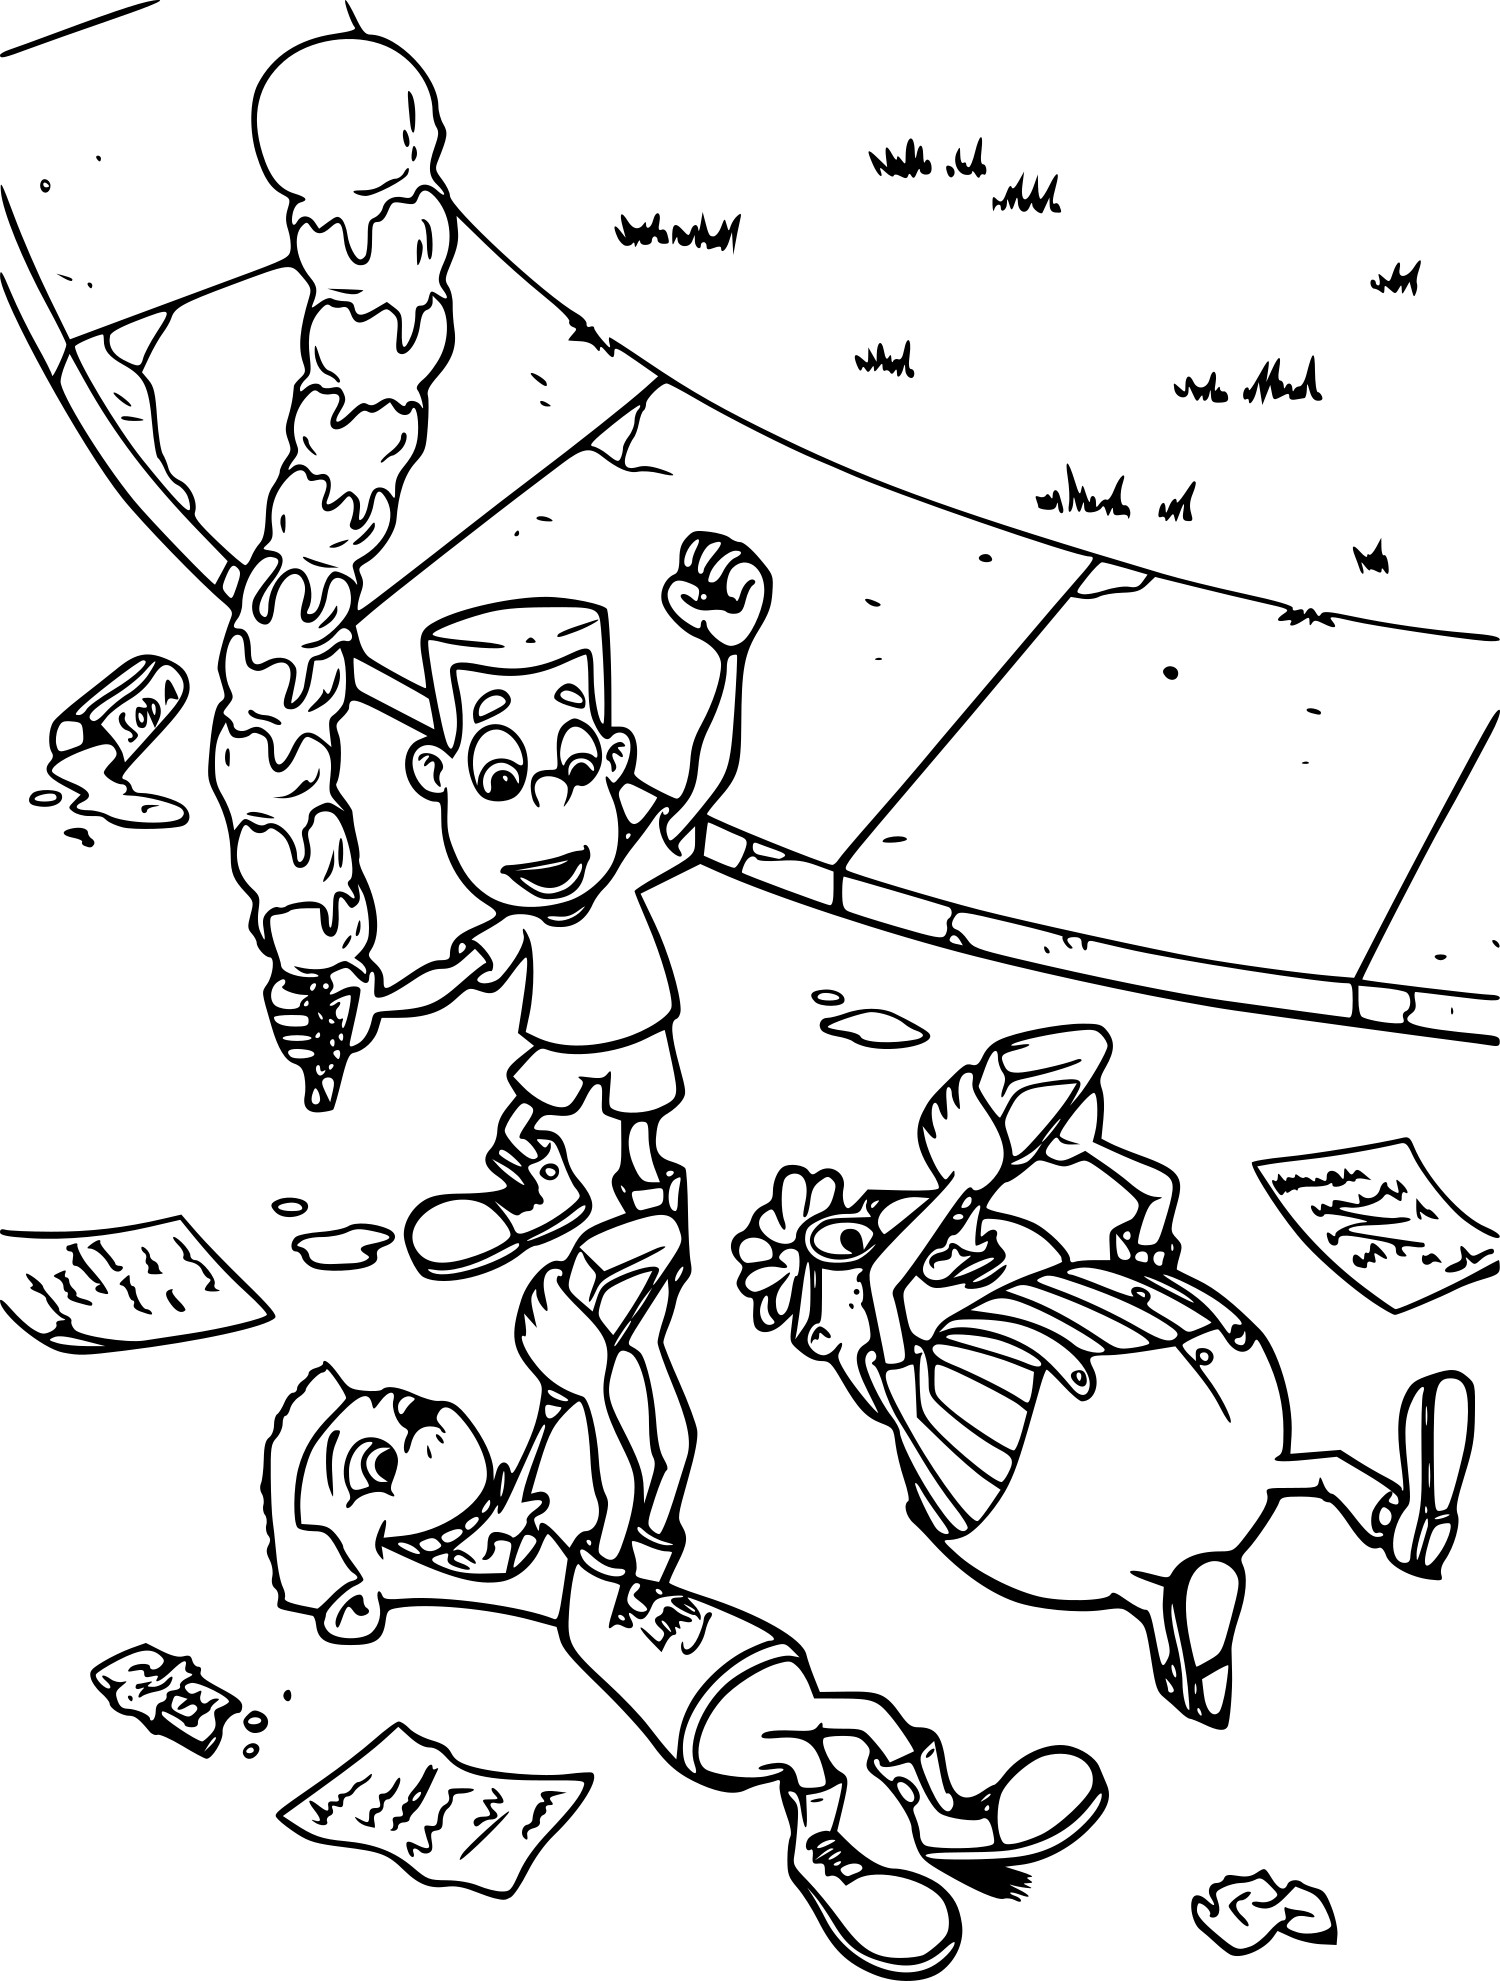 Jimmy Neutron dessin